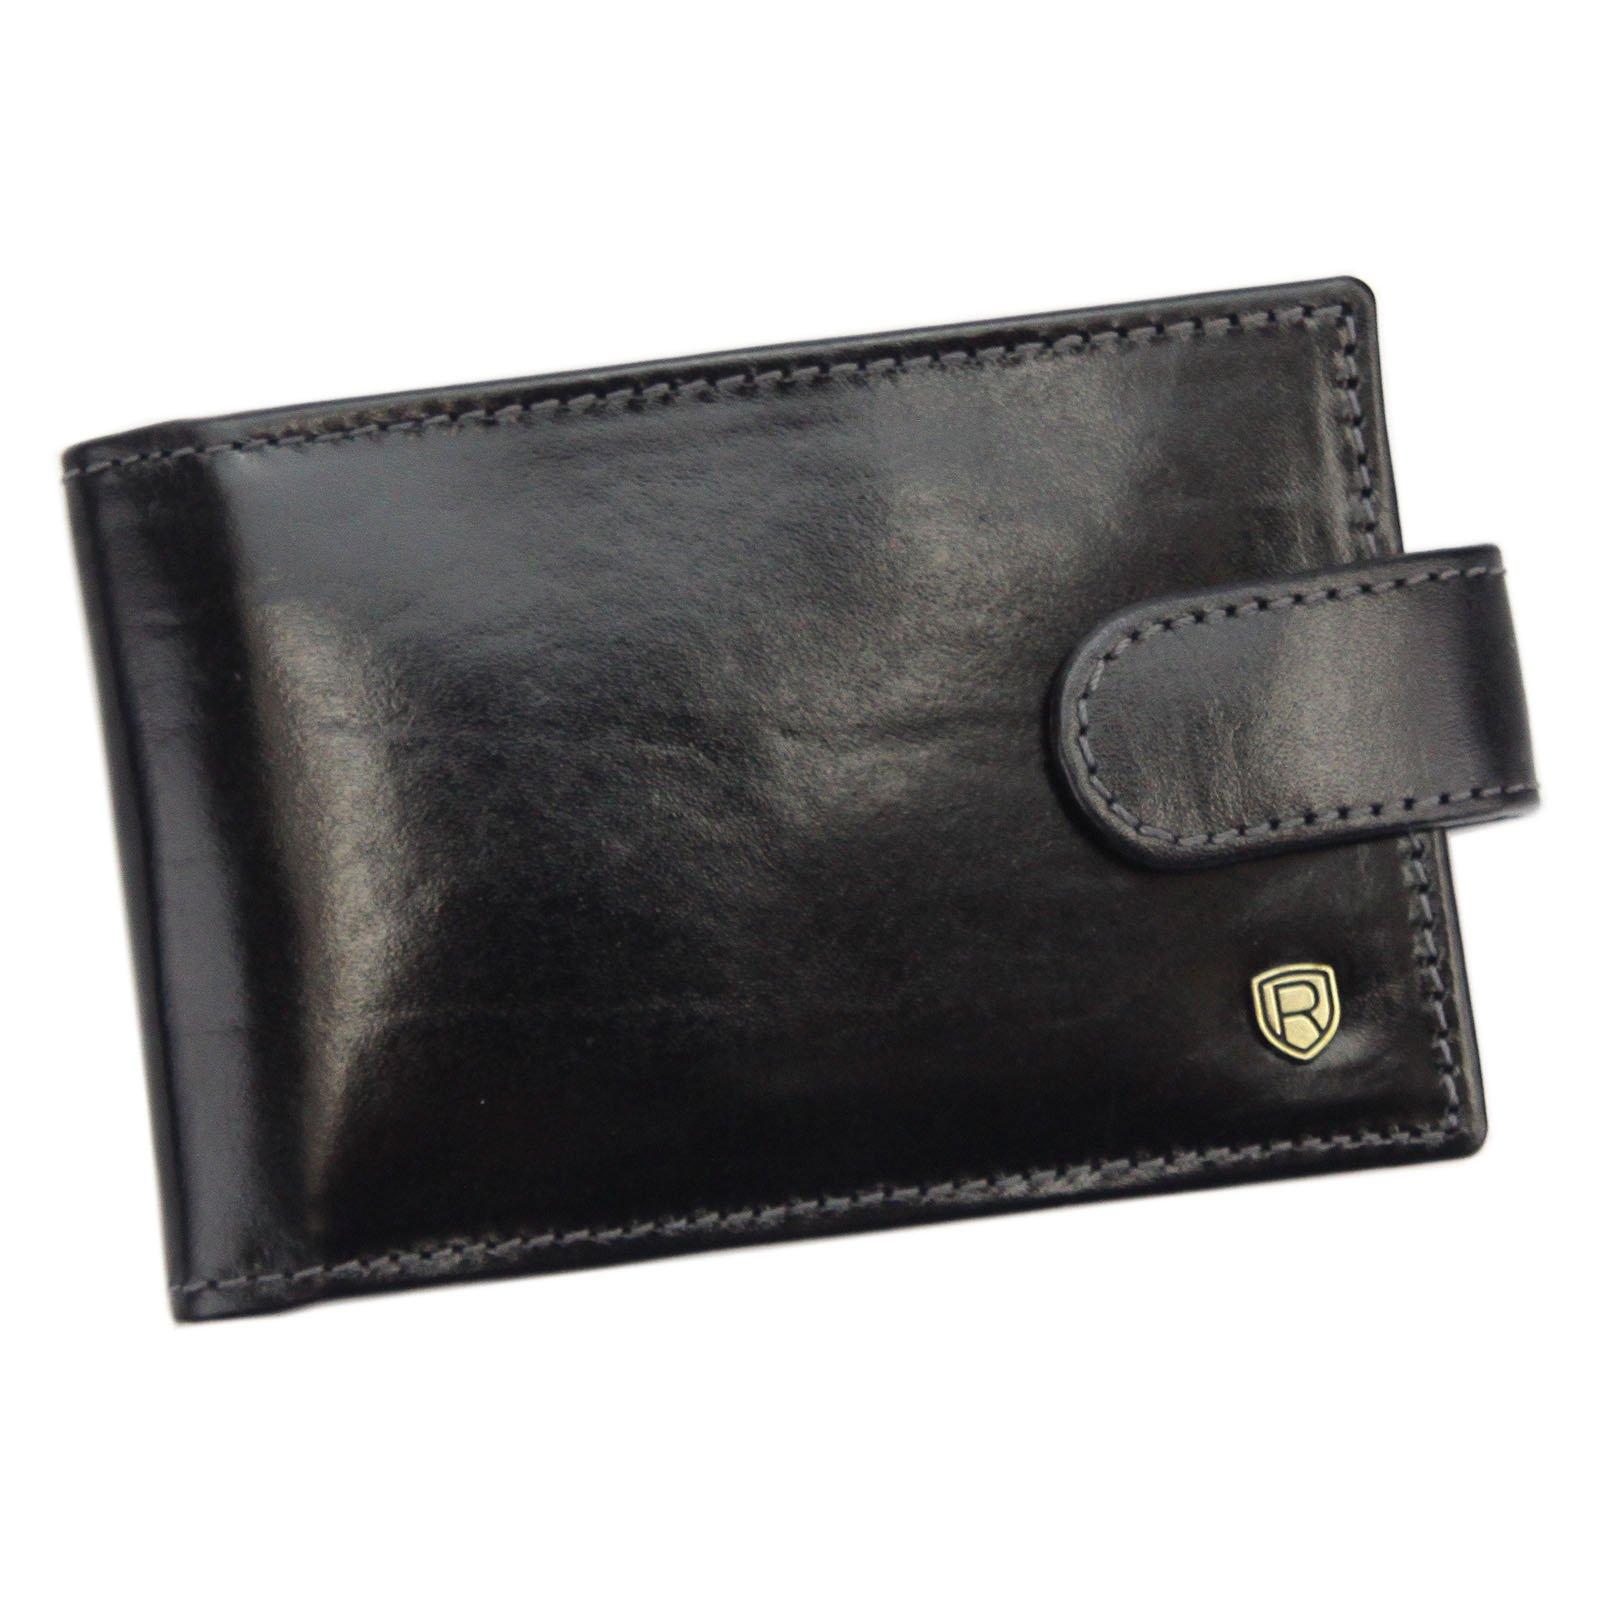 Peňaženka na doklady Rovicky TW-02-RVT